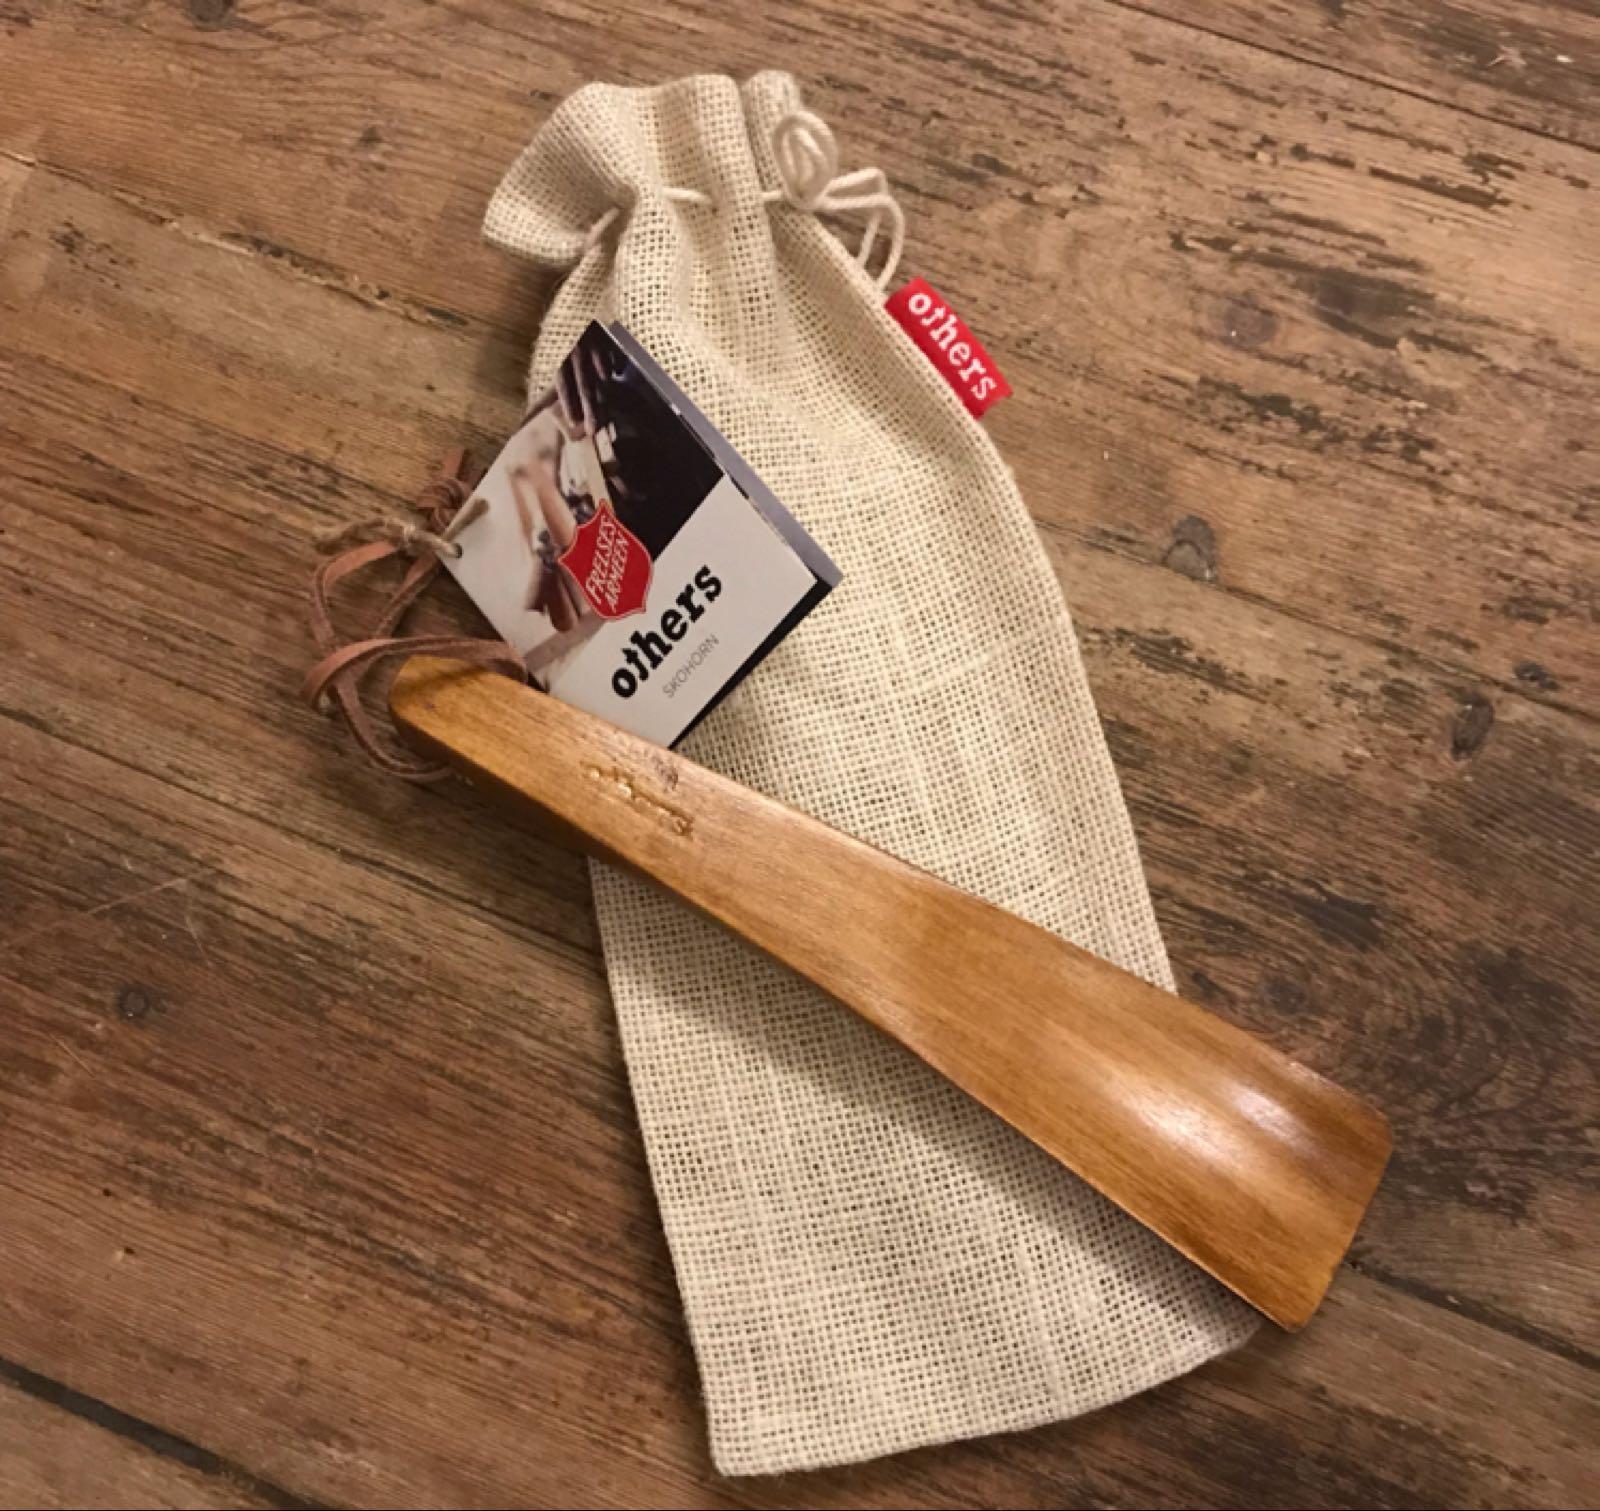 Skohorn 20 cm